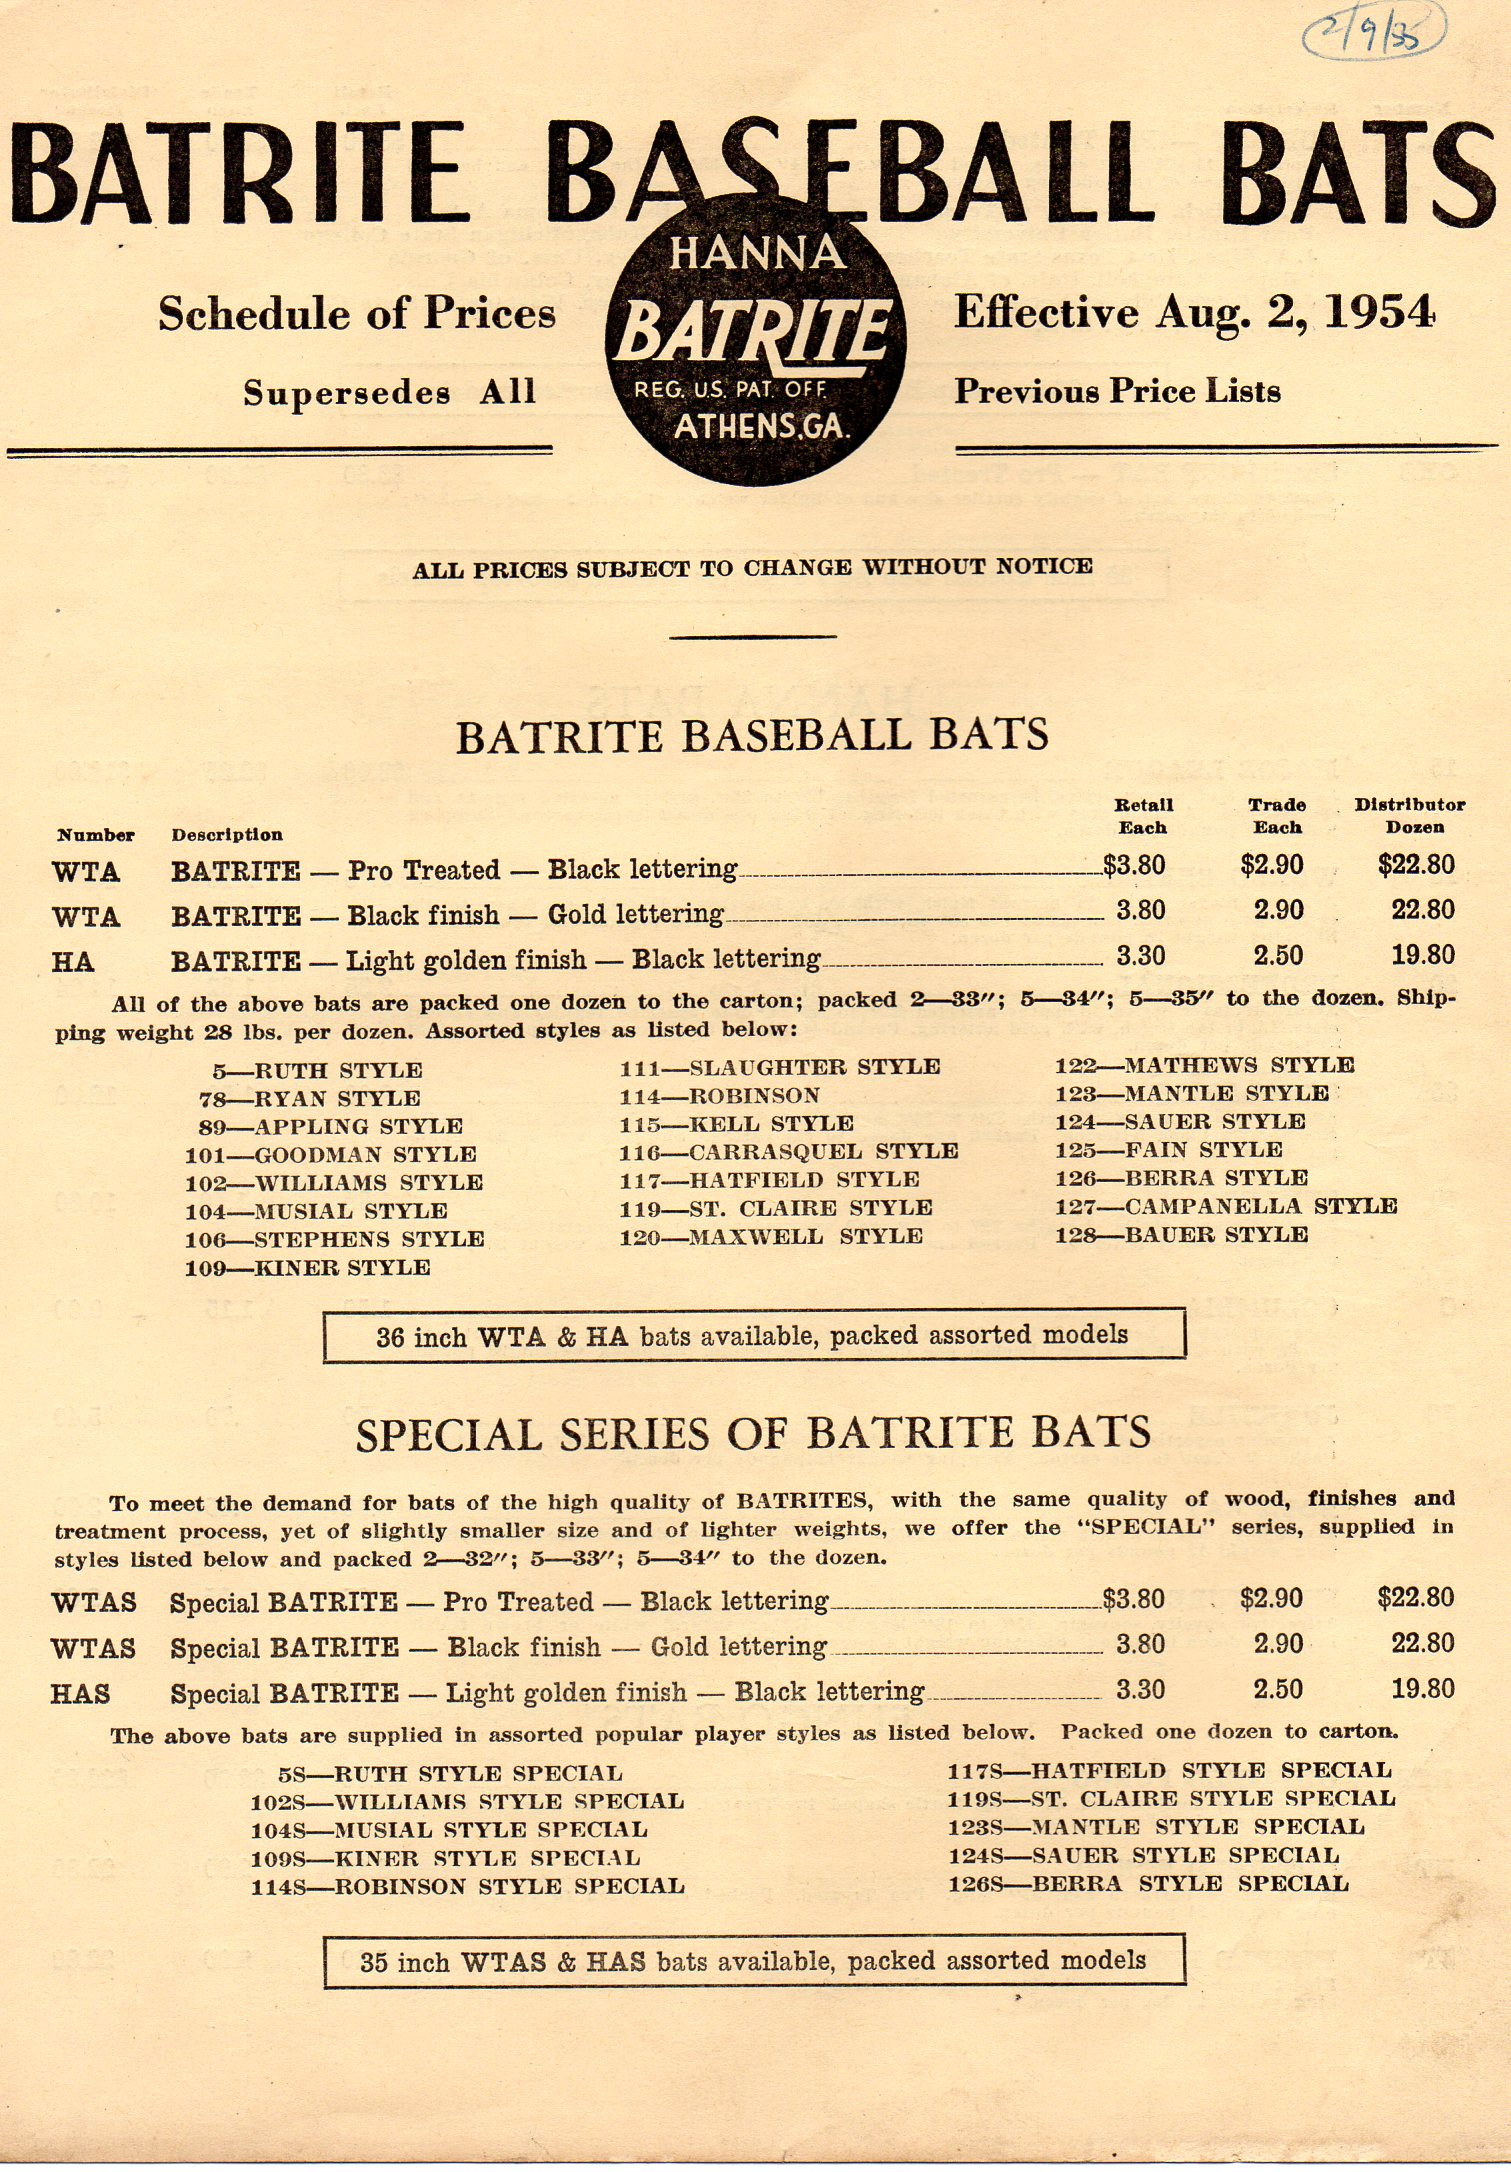 1954 price list